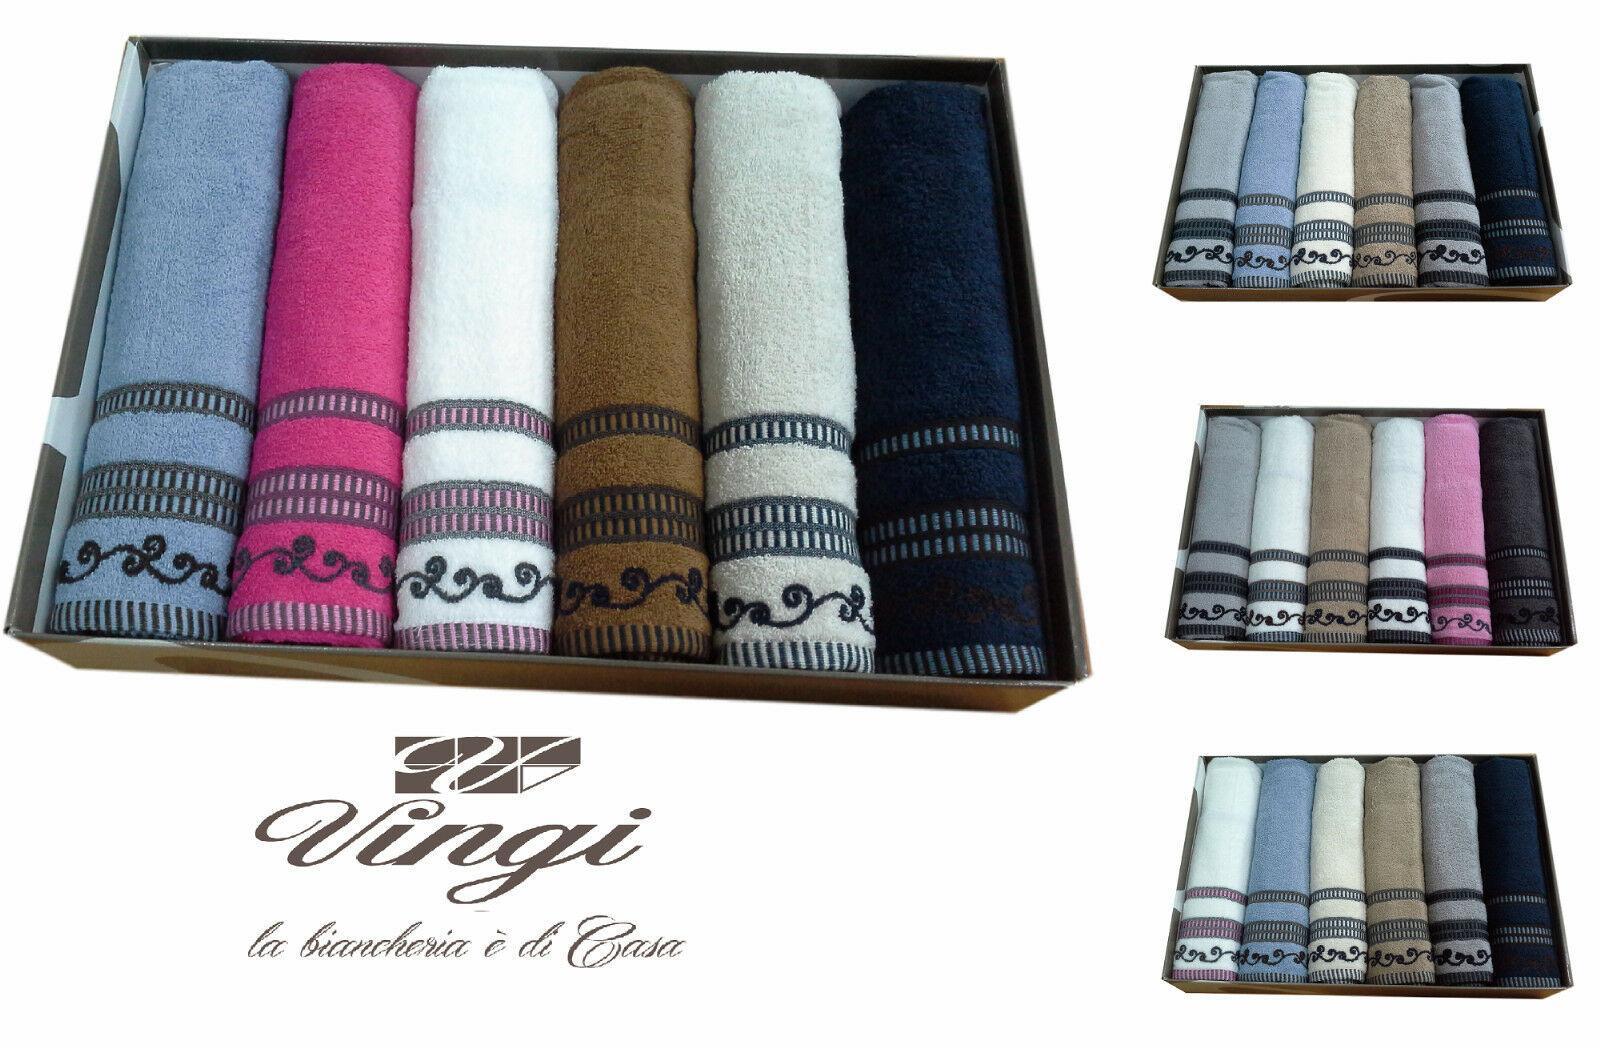 Set 12 asciugamani spugna. VINGI RICAMI, MARINA. 6 Viso + 6 ospite. 100% Cotone.